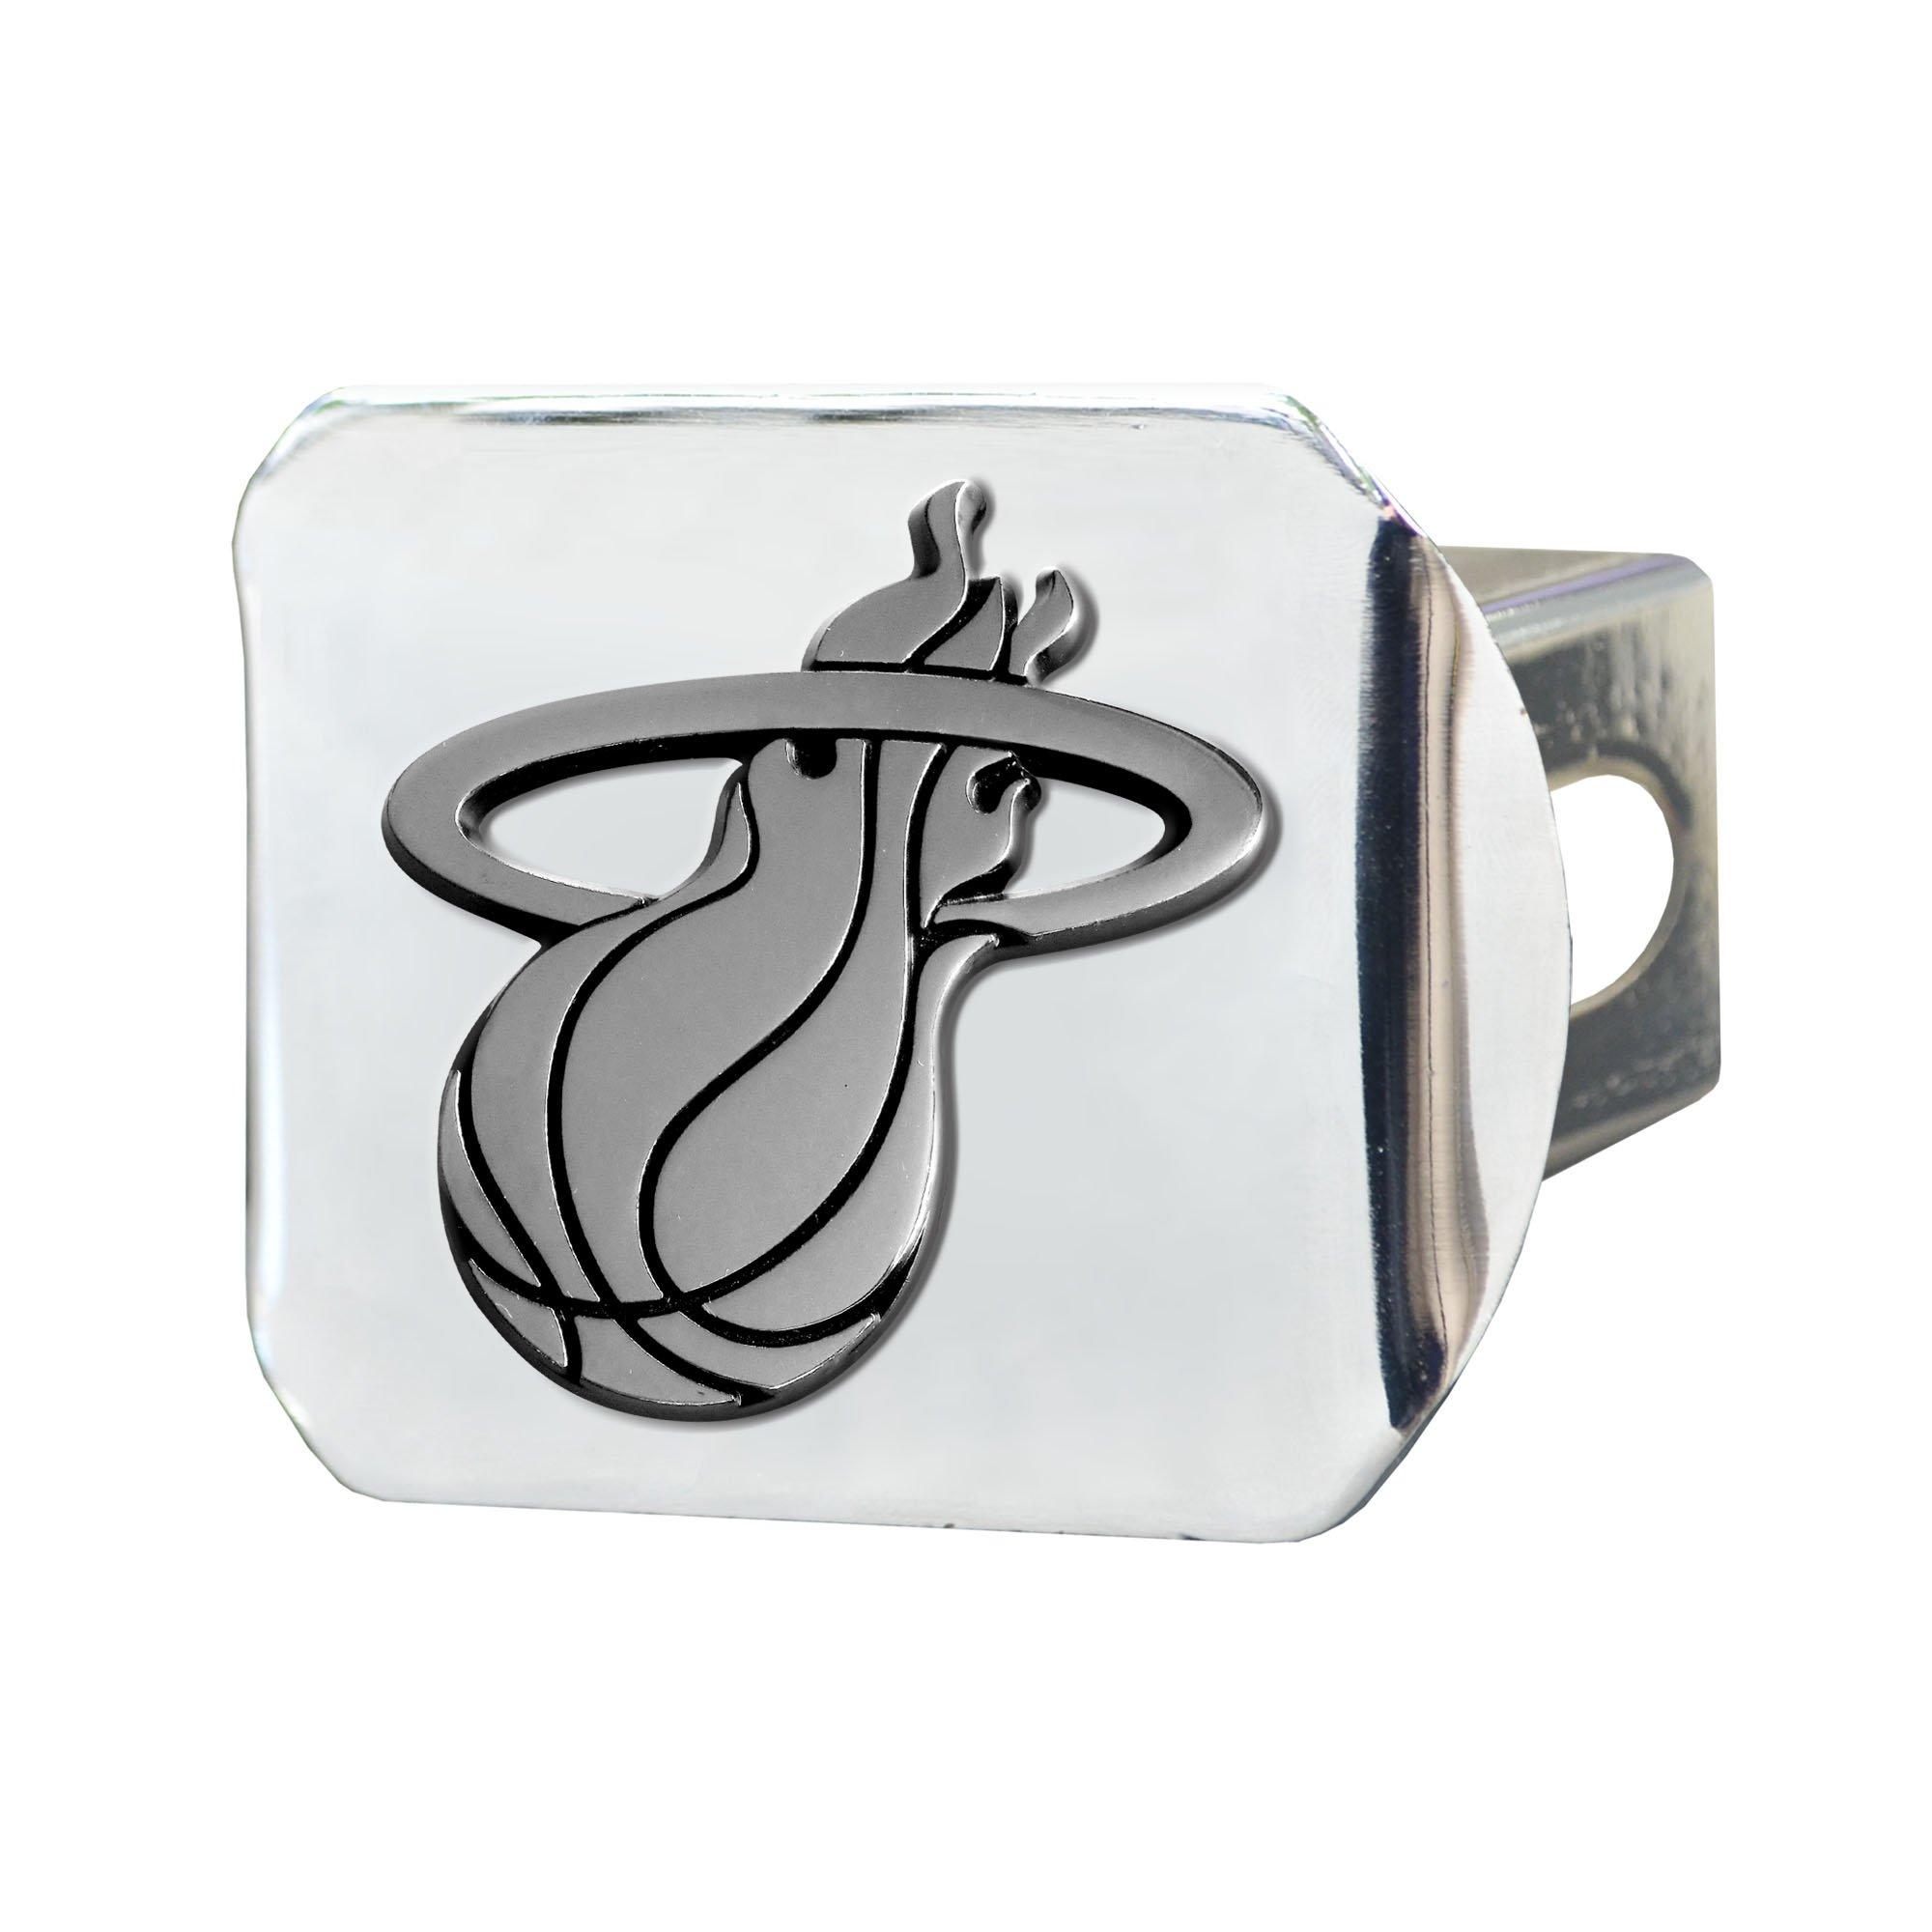 Fanmats NBA Miami Heat Chrome Hitch Cover